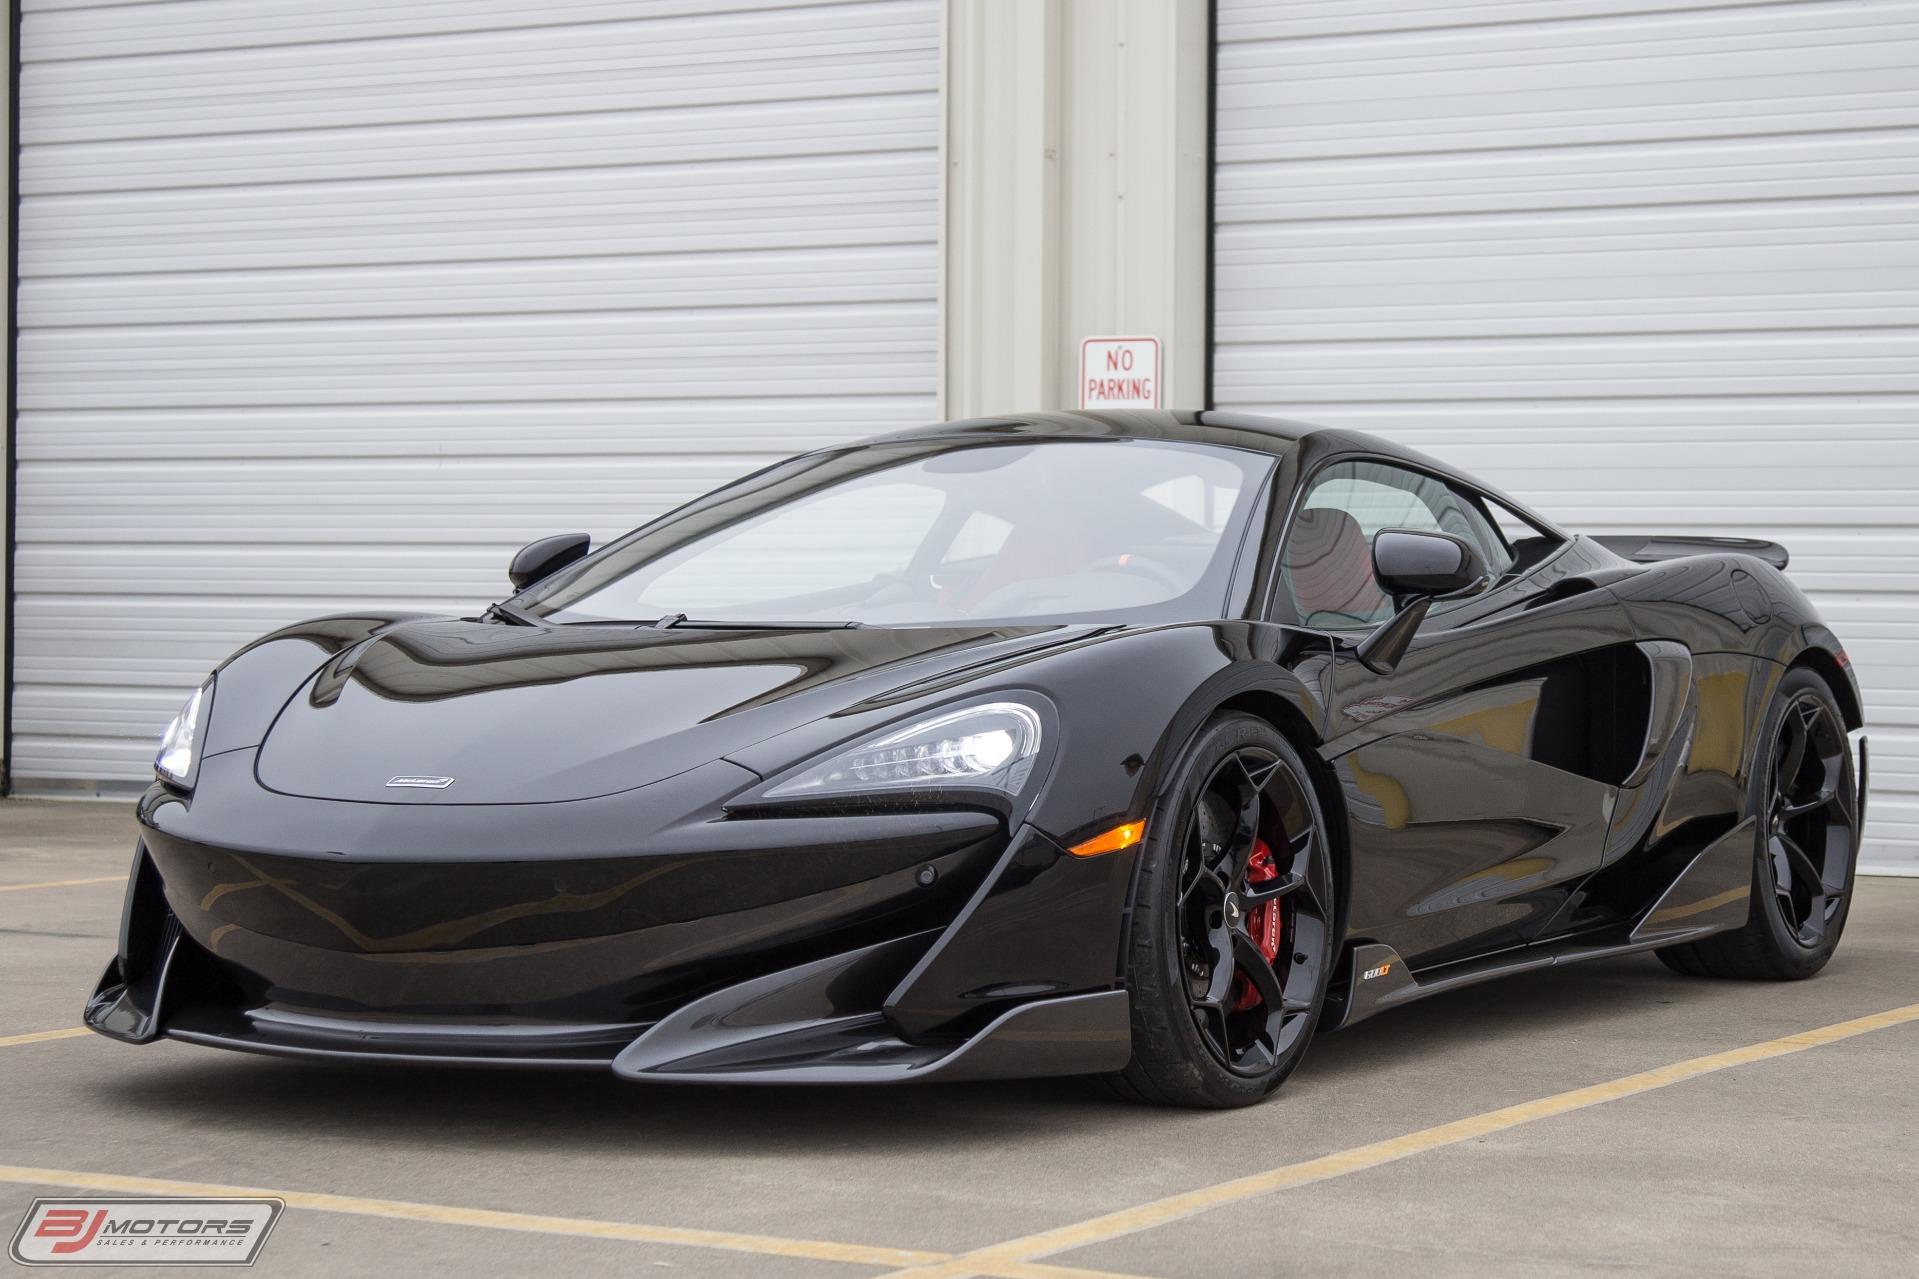 Used-2019-McLaren-600LT-Only-43-miles